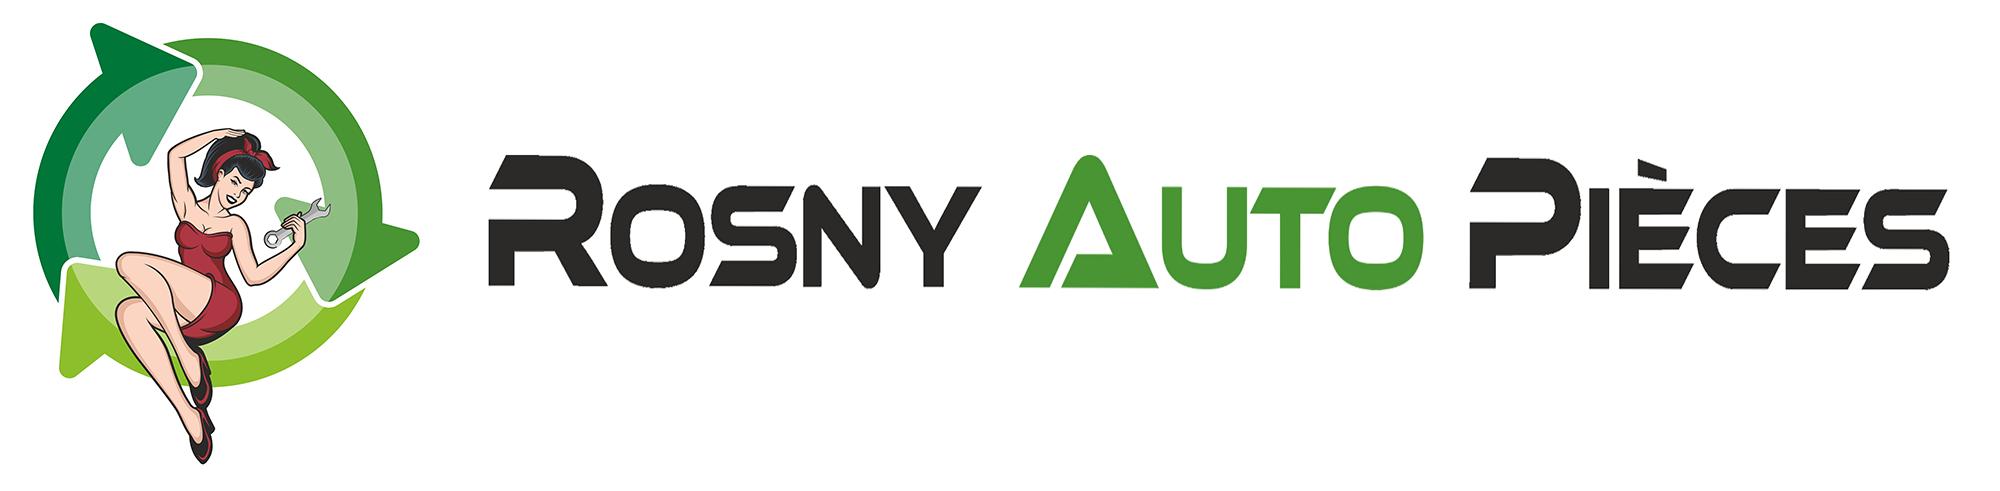 Logo Rosny Auto Pièces